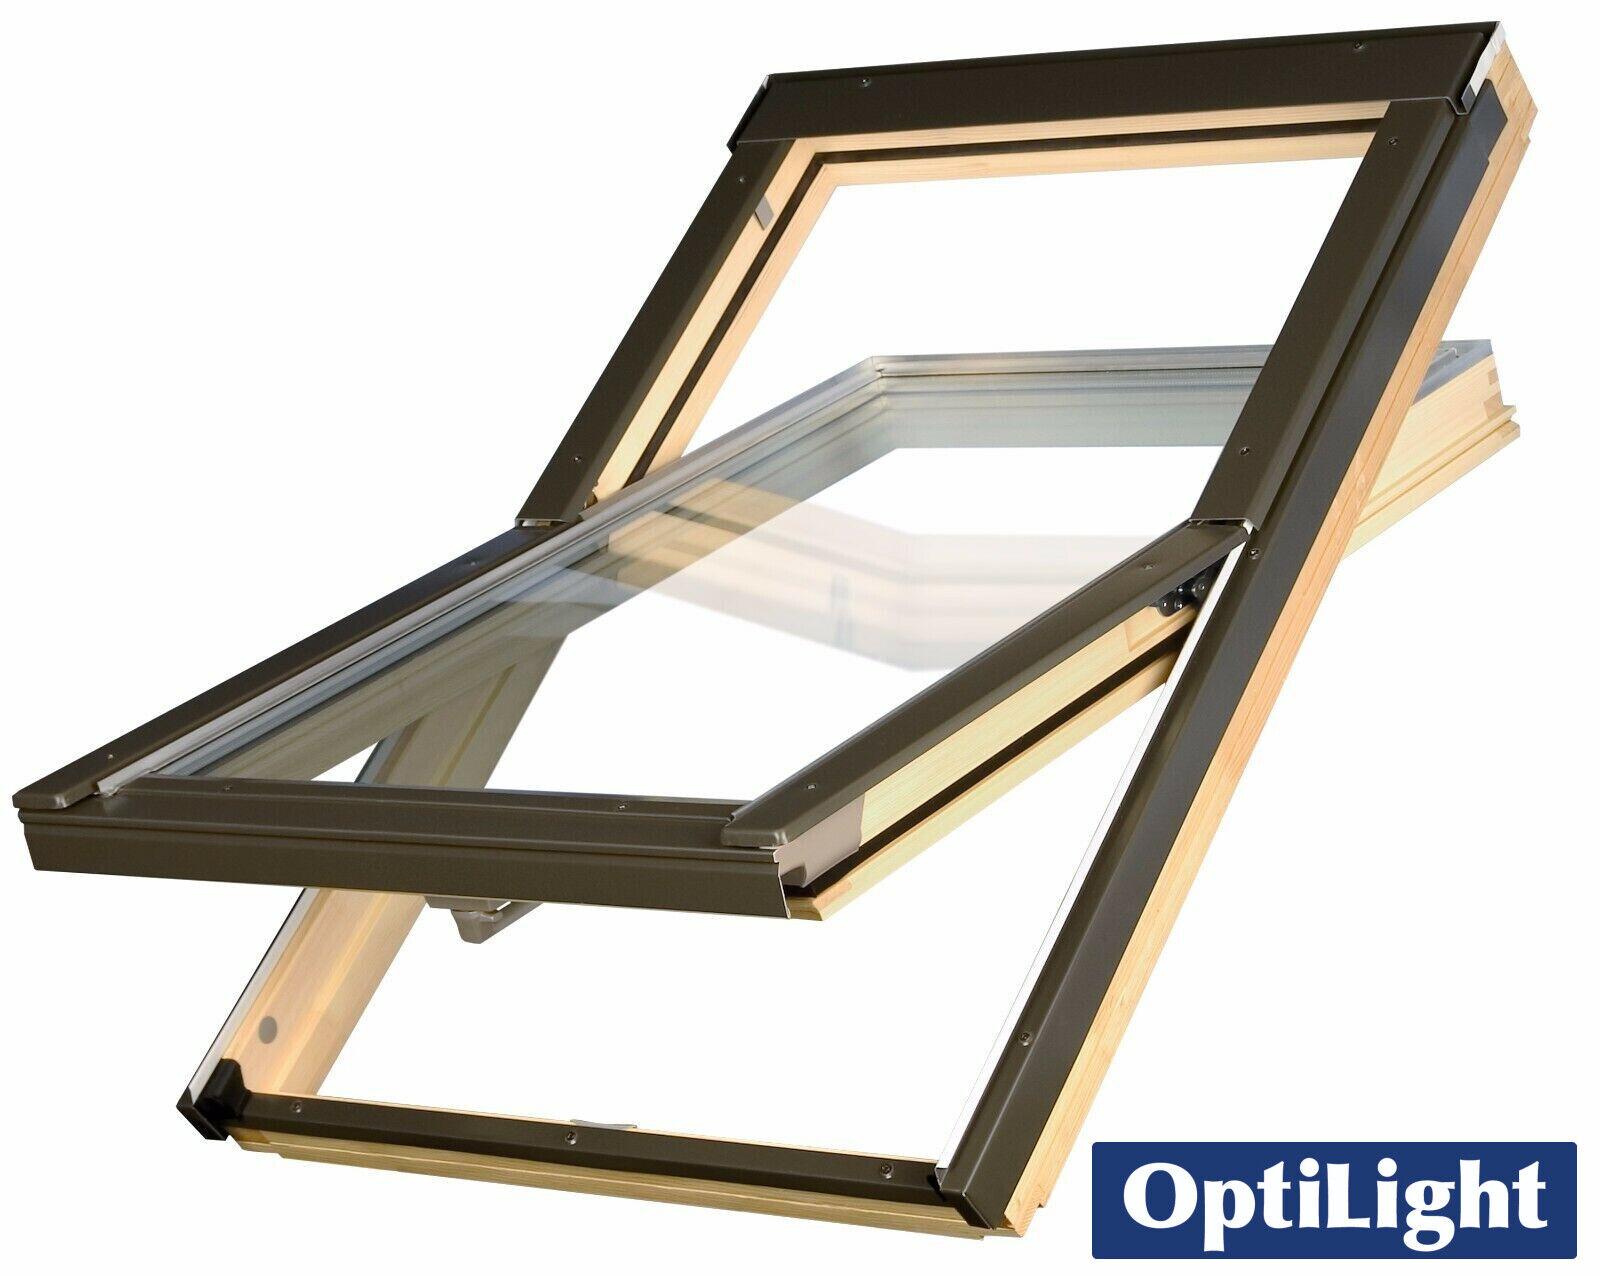 Optilight Pine Roof Window Centre Pivot Flashing Kit Loft Skylight Rooflight